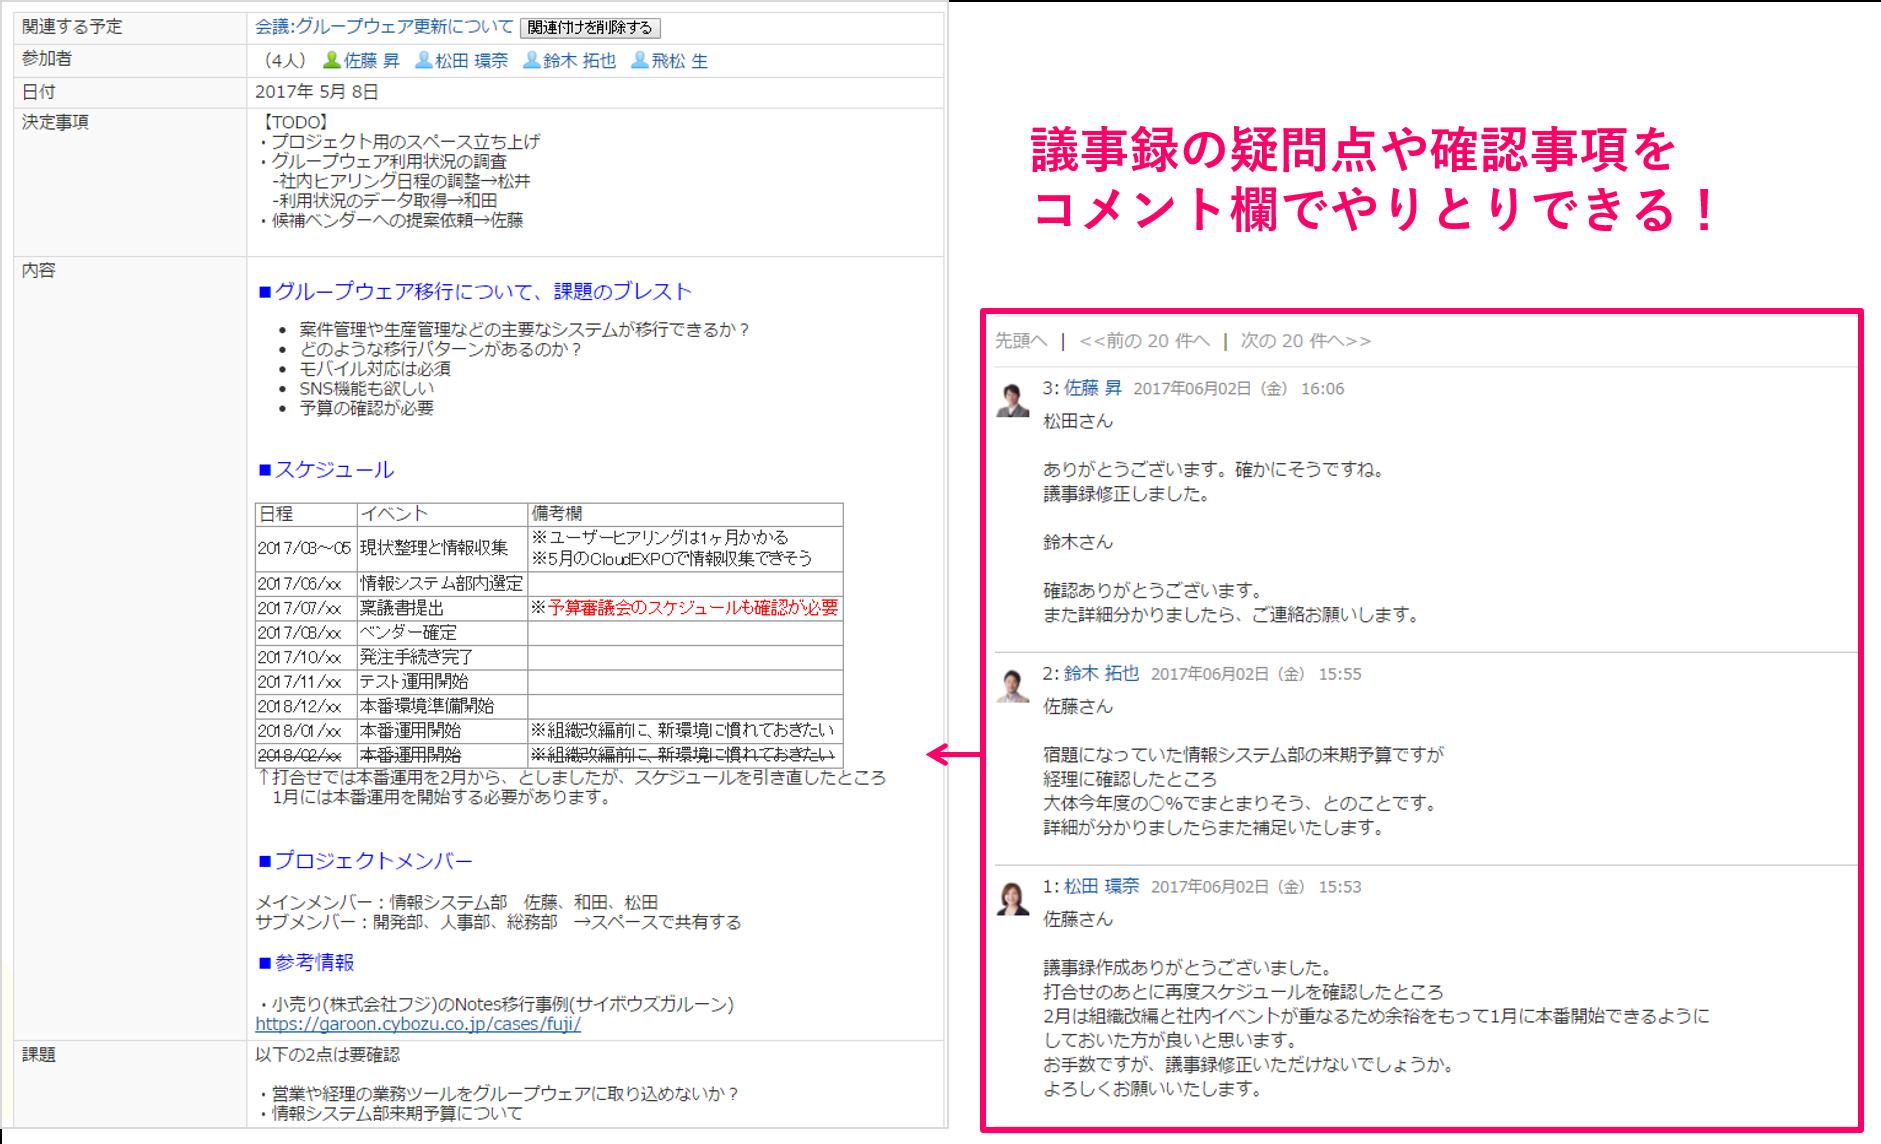 https://enterprise.cybozu.co.jp/a19d6981e4685755c46a626db24bc65ae475bfea.png